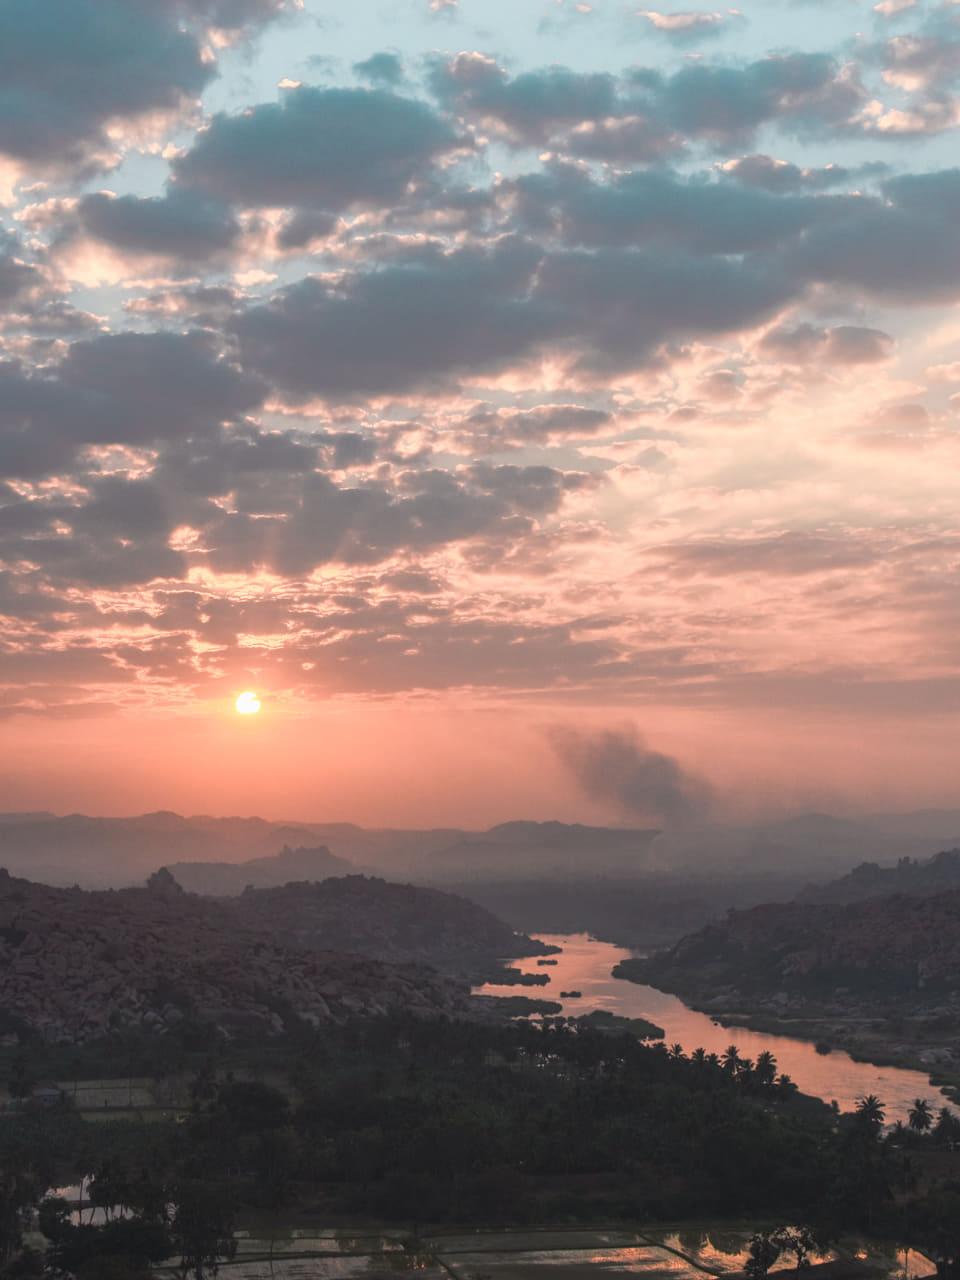 sunrise from anjana parvath or monkey hill hampi